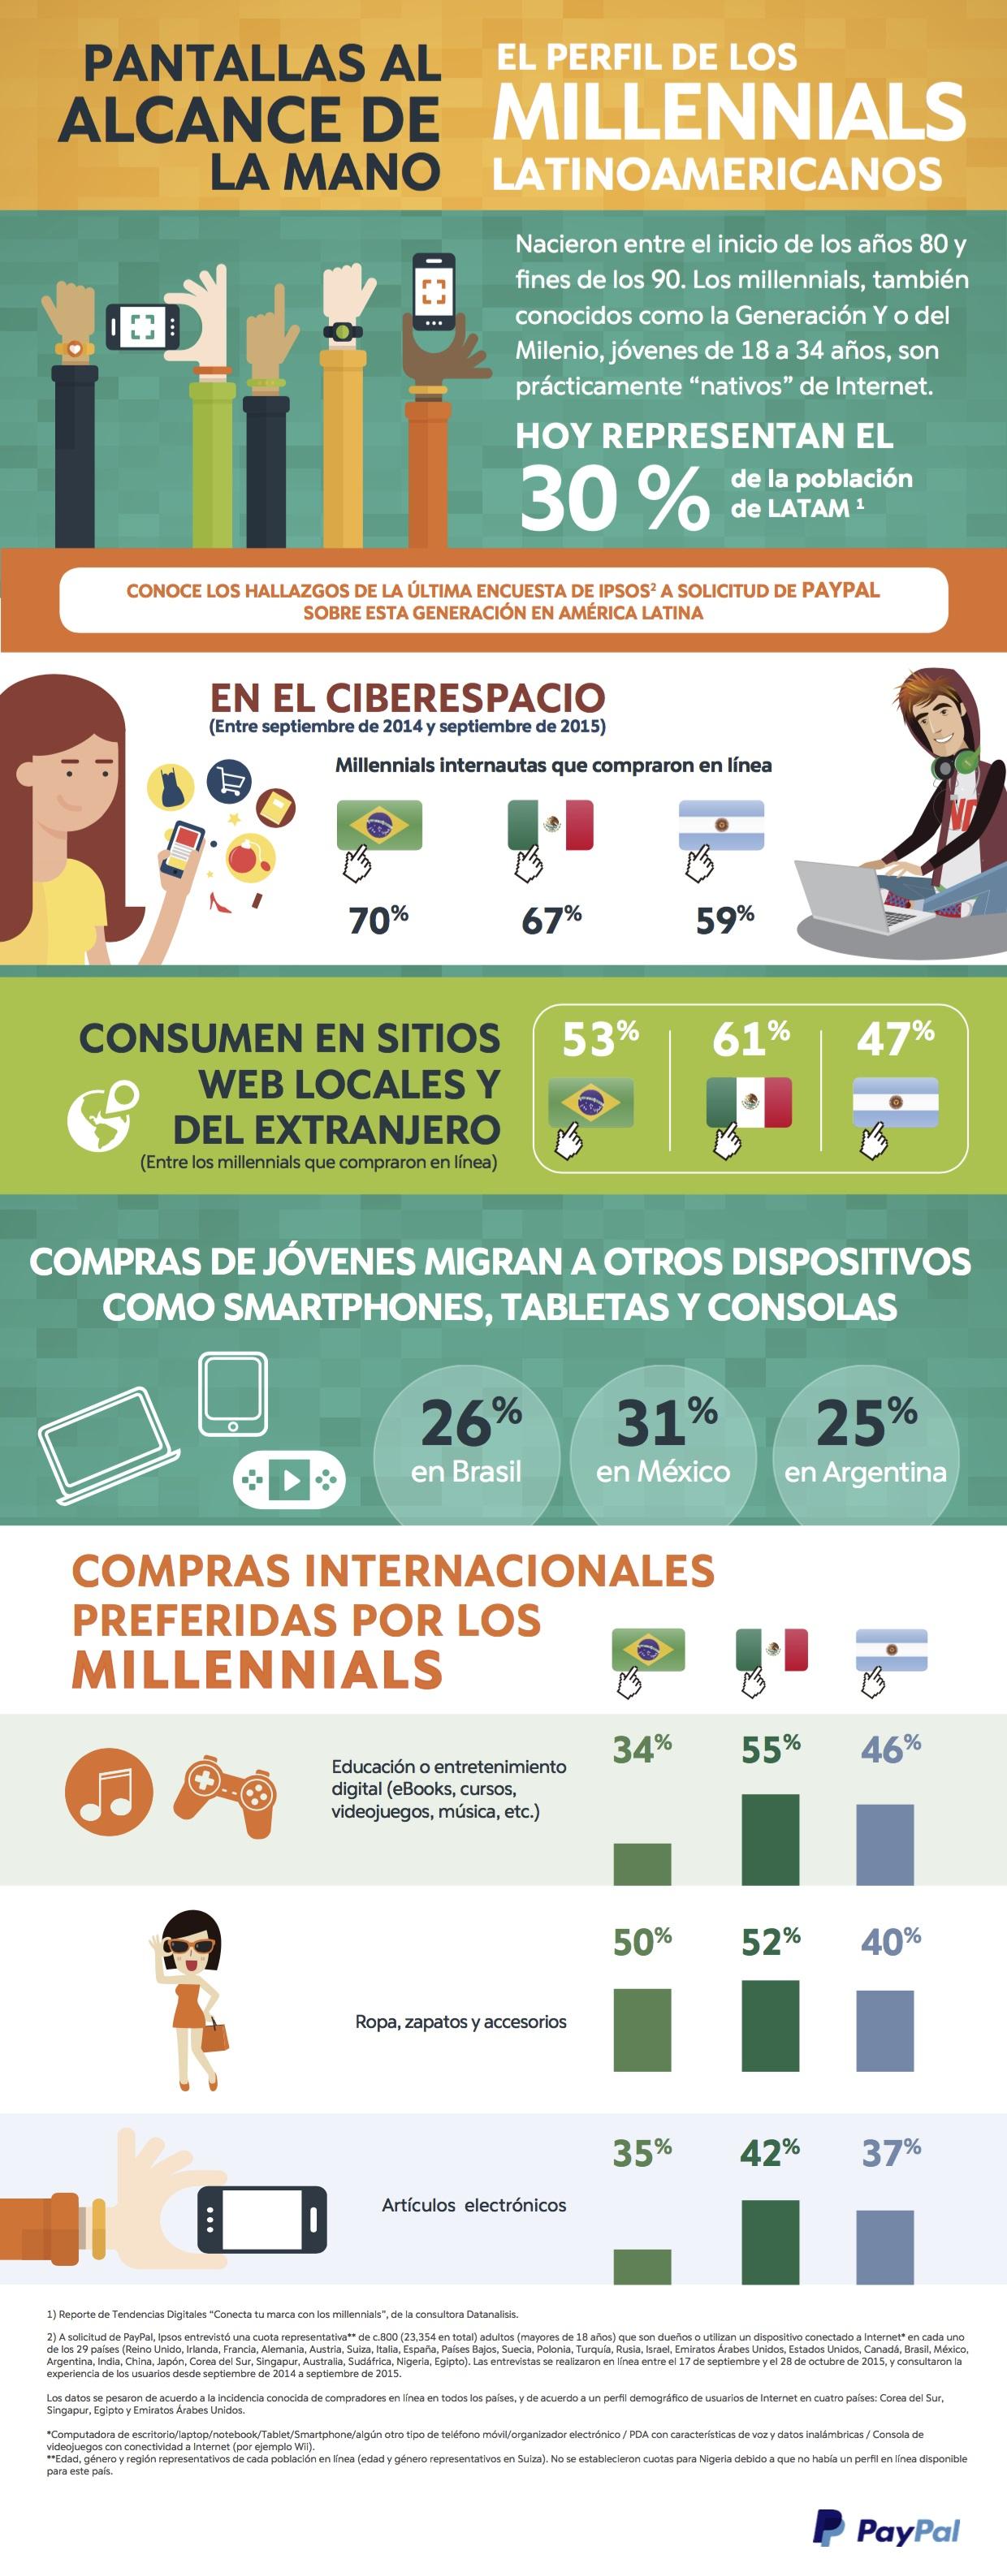 Millenials Latinoamericanos